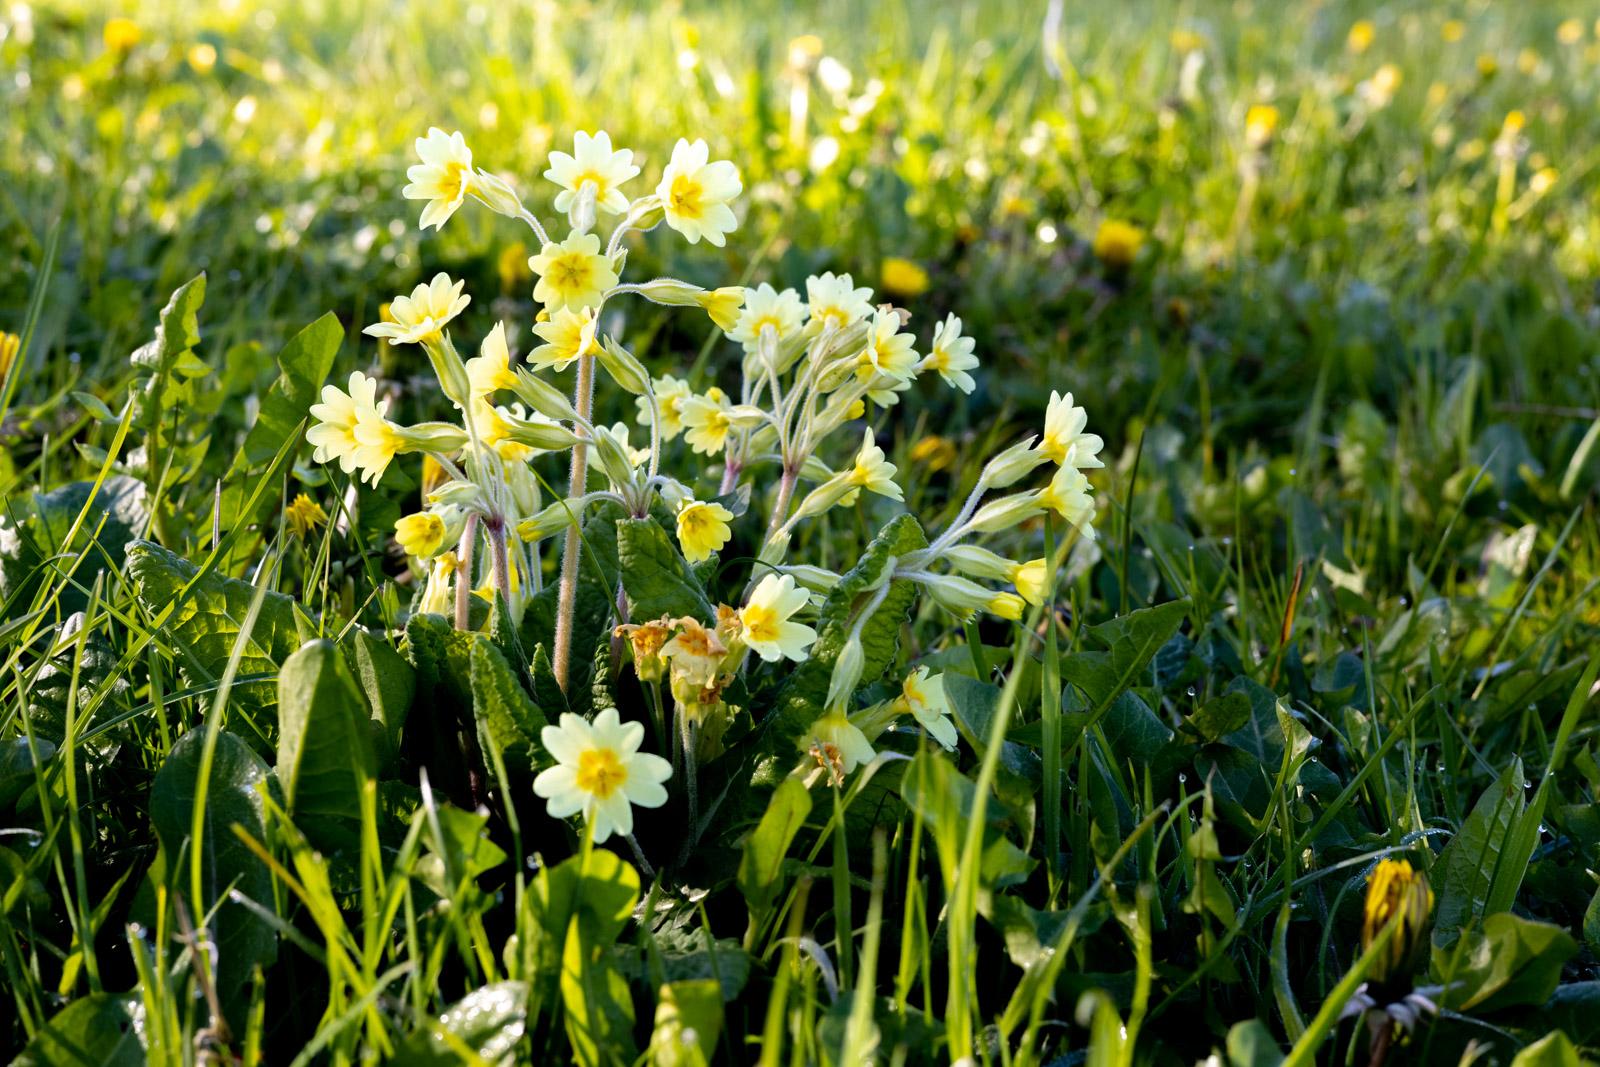 False oxlip (Primula vulgaris x veris) - Bagley, Nr Wedmore, Somerset, UK. ID B011891